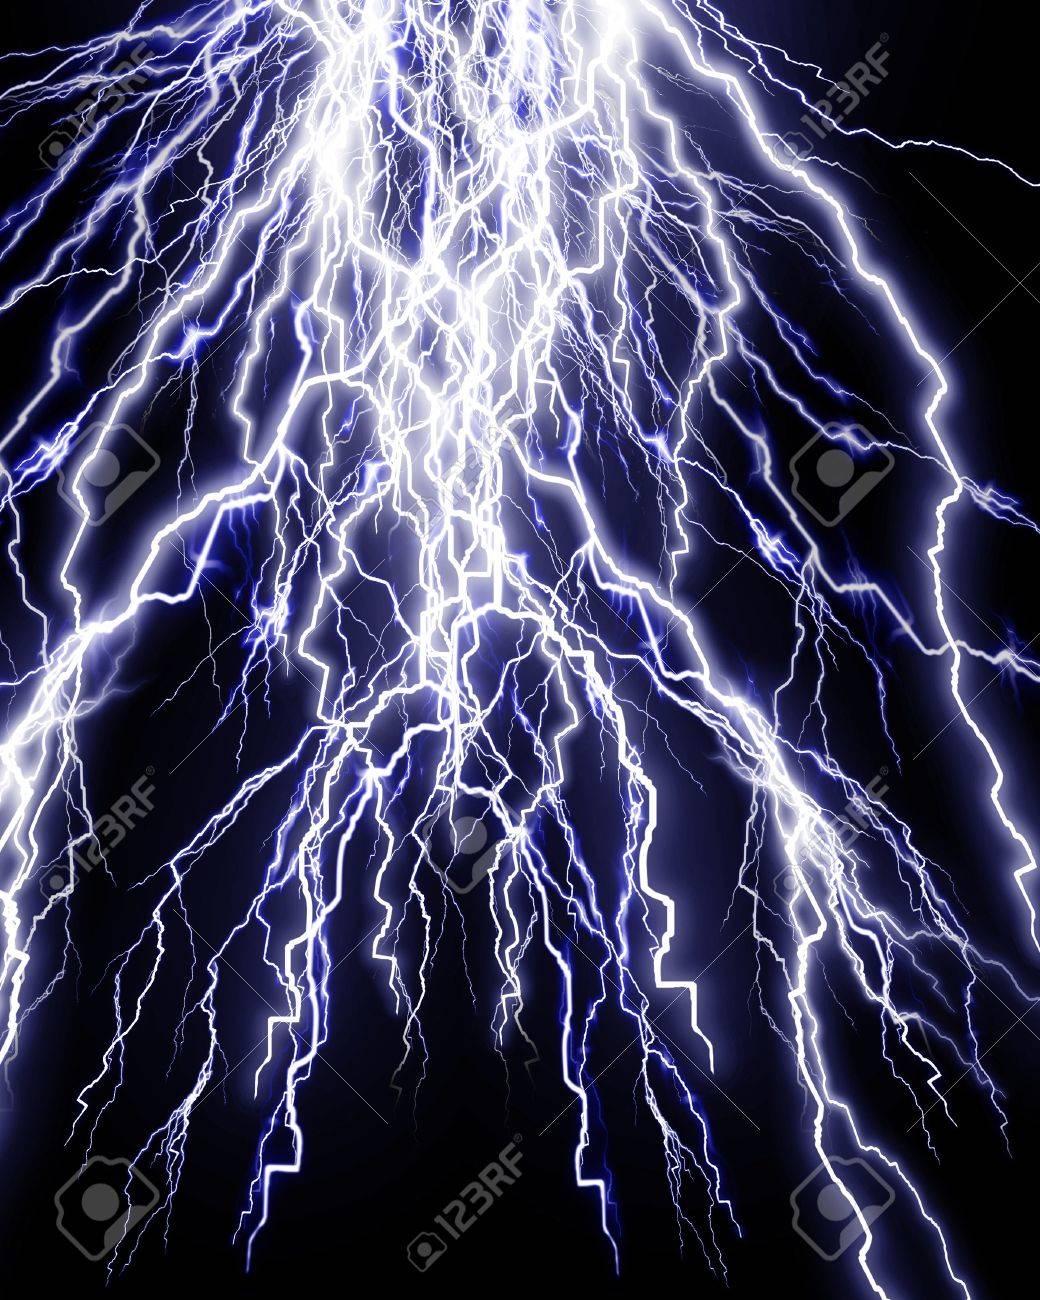 a55c90f46cc2 Intense lightning storm on a dark background Stock Photo - 4079493